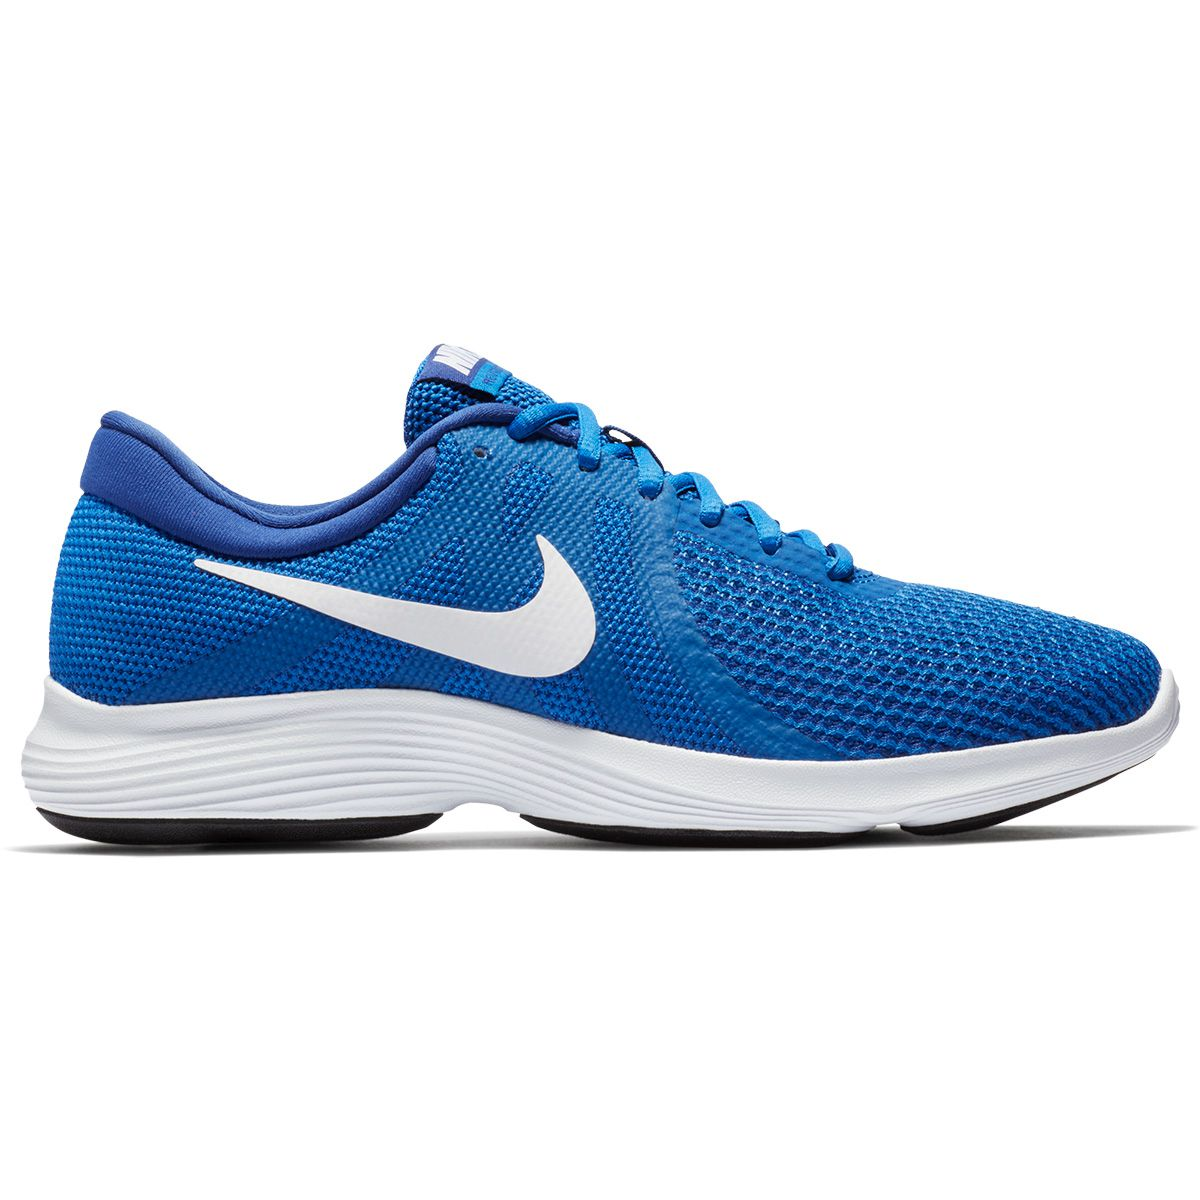 Tenis Nike Revolution 4 Original